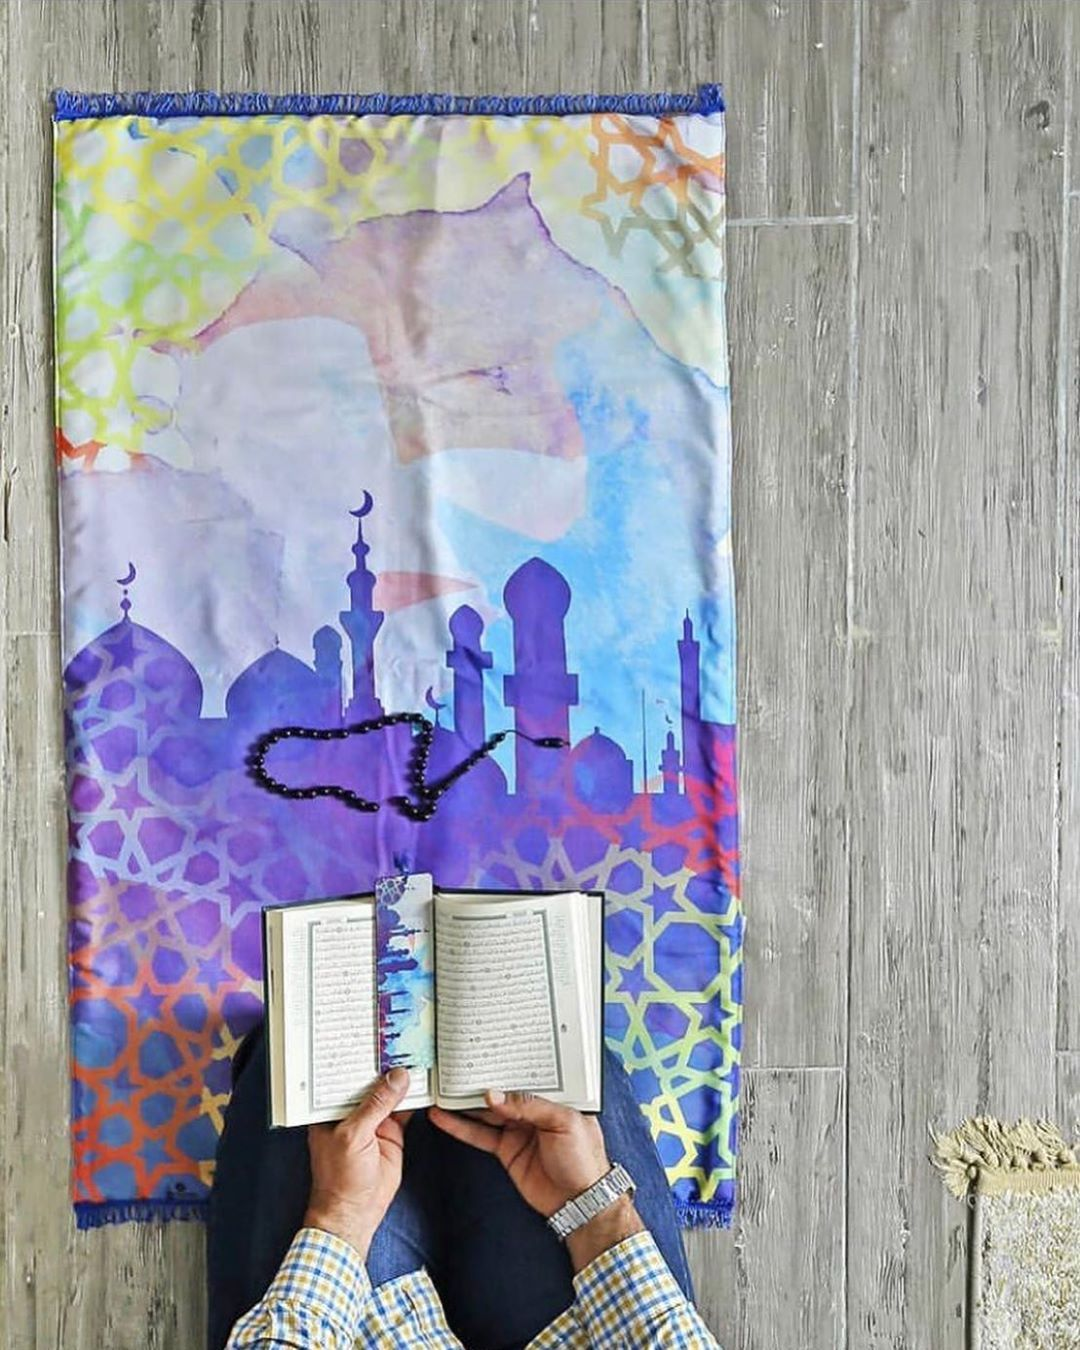 New The 10 Best Home Decor With Pictures جديد معارض البحرين جوالات فيروز الخبر الكويت الجبيل الرياض سجاد Lily Pulitzer Lily Lily Pulitzer Dress